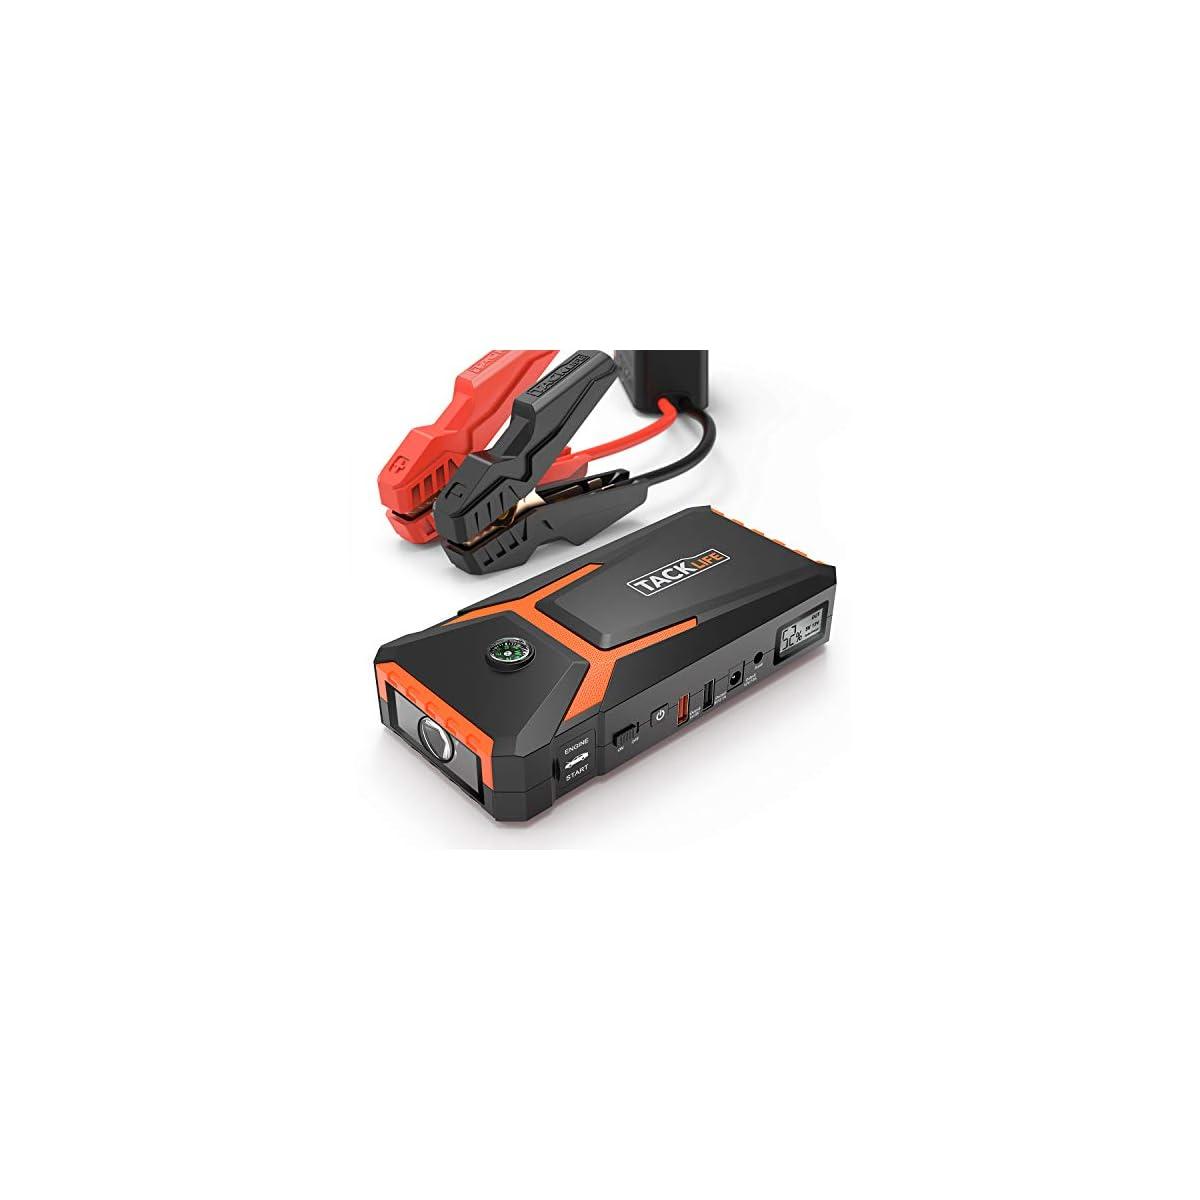 51p2rwLoydL. SS1200  - TACKLIFE T8 Arrancador de Coche - 800A/18000mAh Arrancador Coche, Ultra-Seguro Arrancador de Baterias de Coche (Pinzas Inteligentes, USB de CargaRápida, LEDLuz, PantallaLCD)